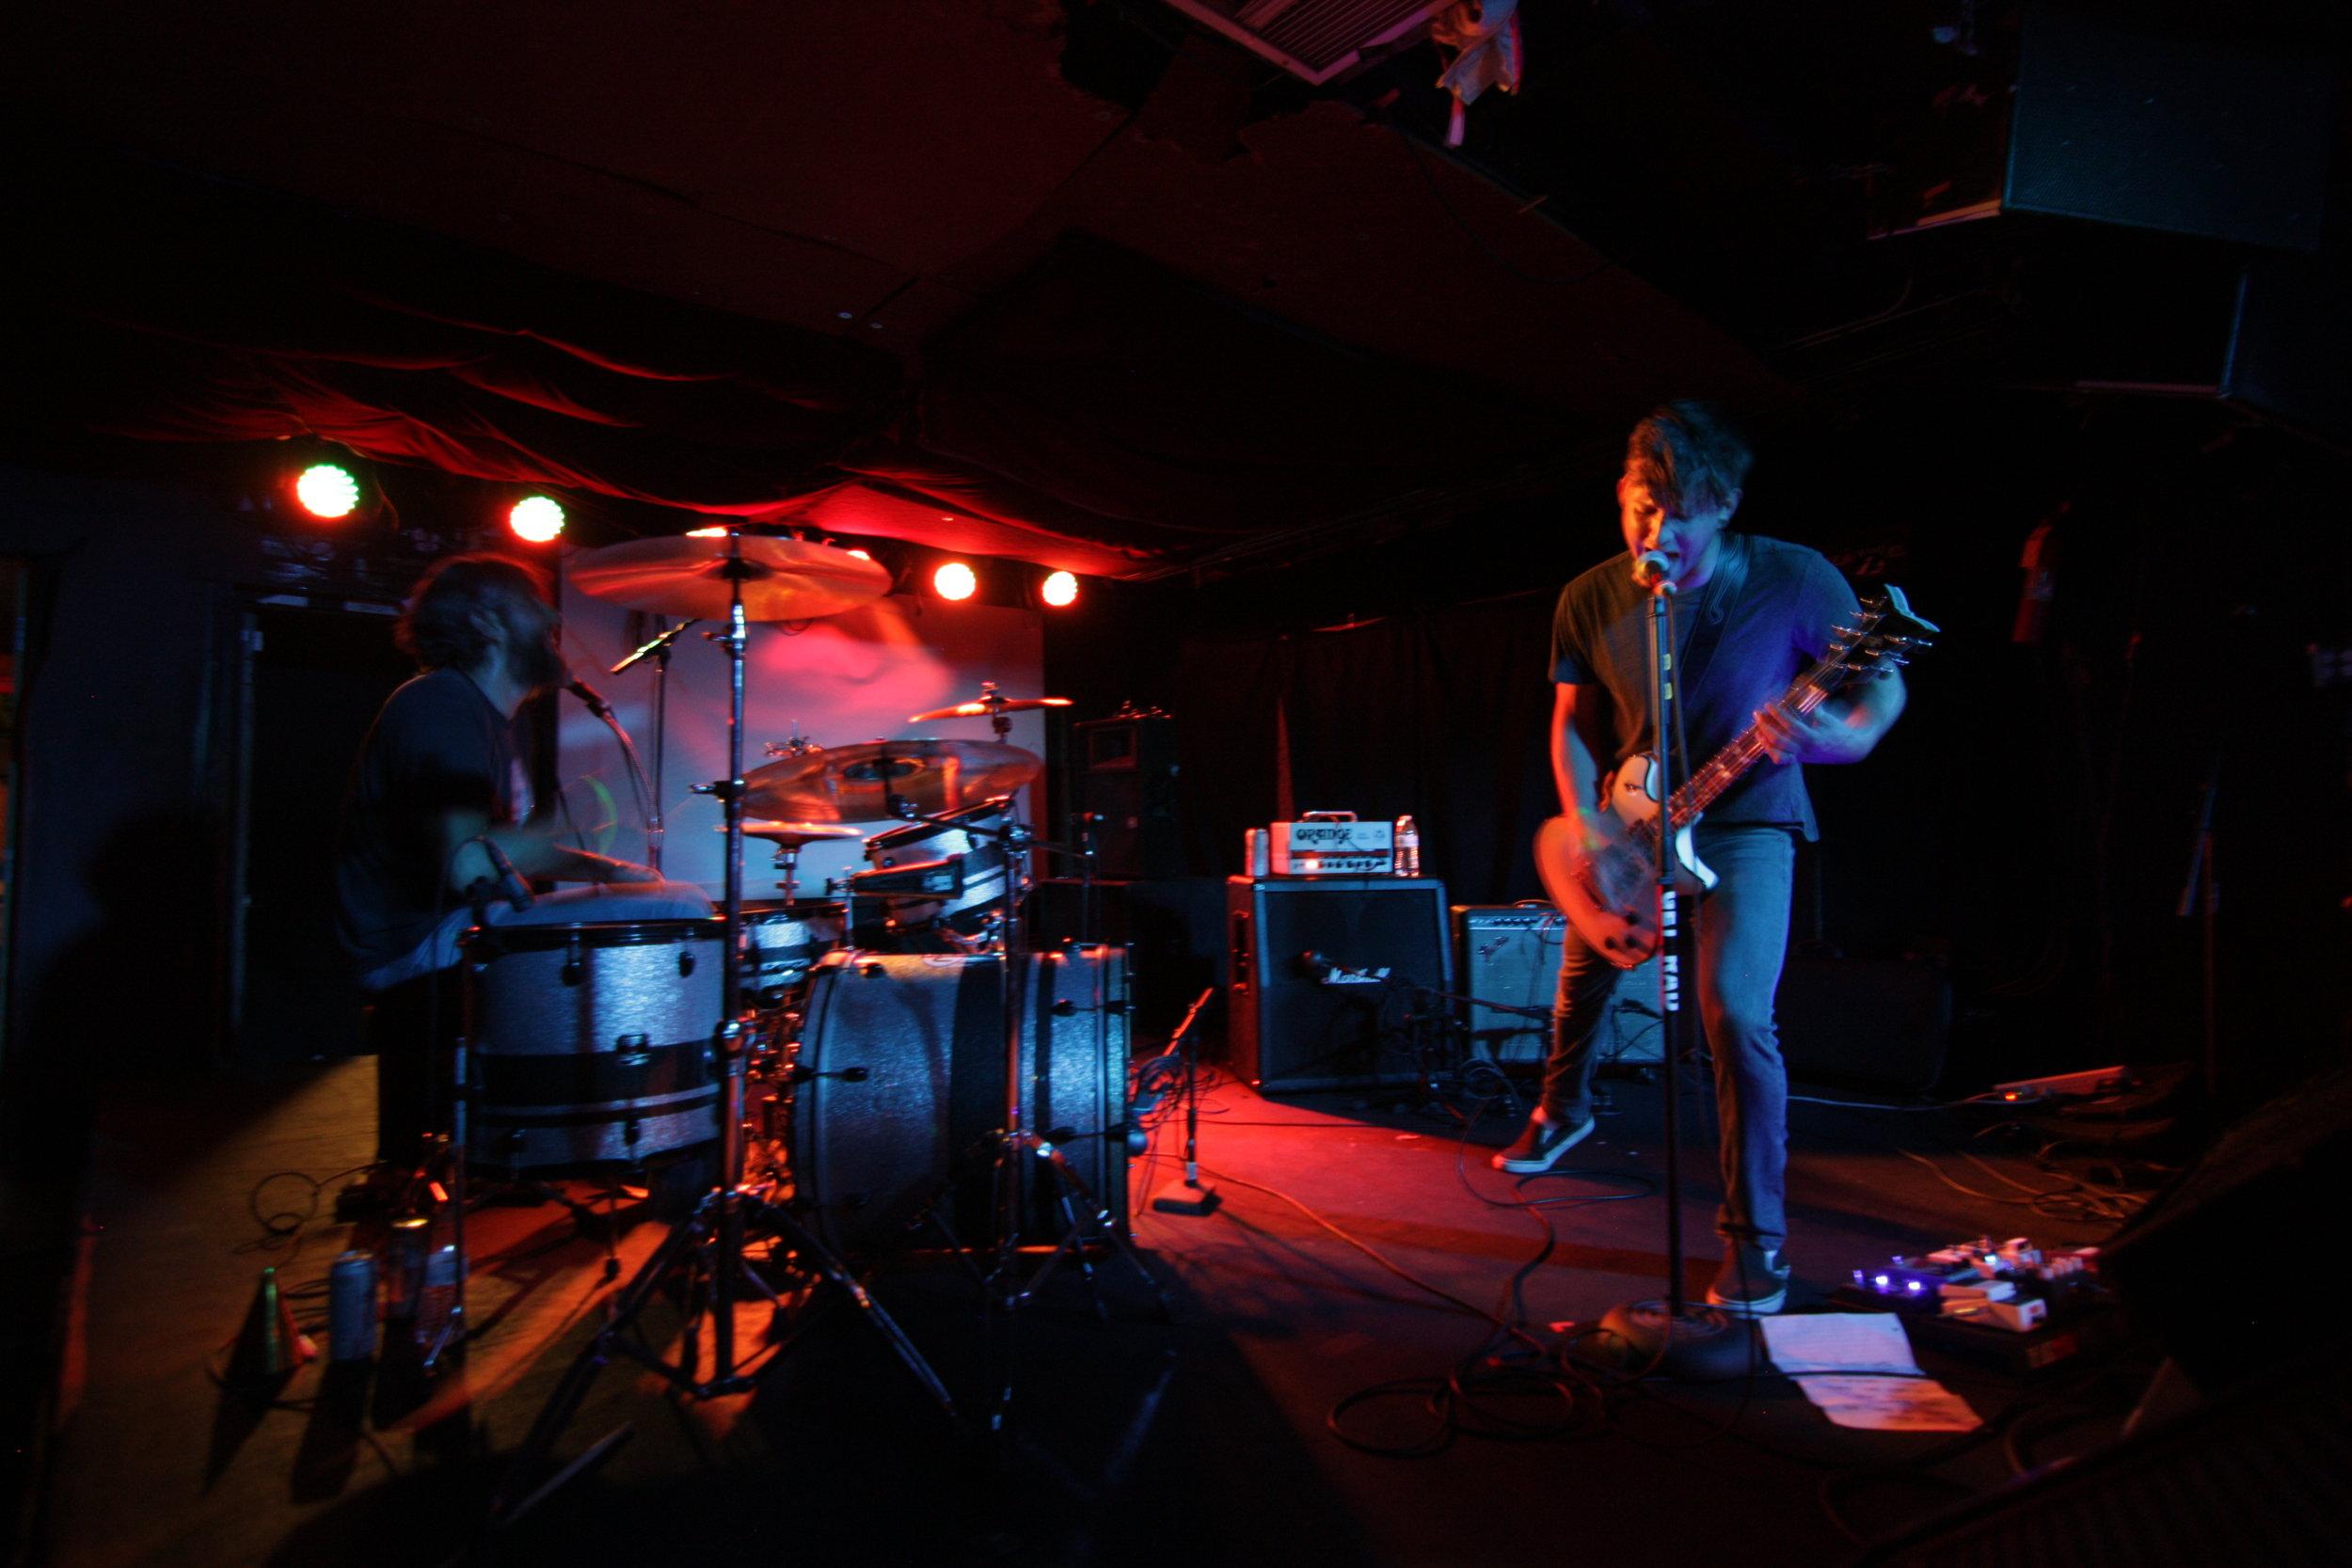 Live @ Larimer Lounge (Photo credit: Jack Stewart)